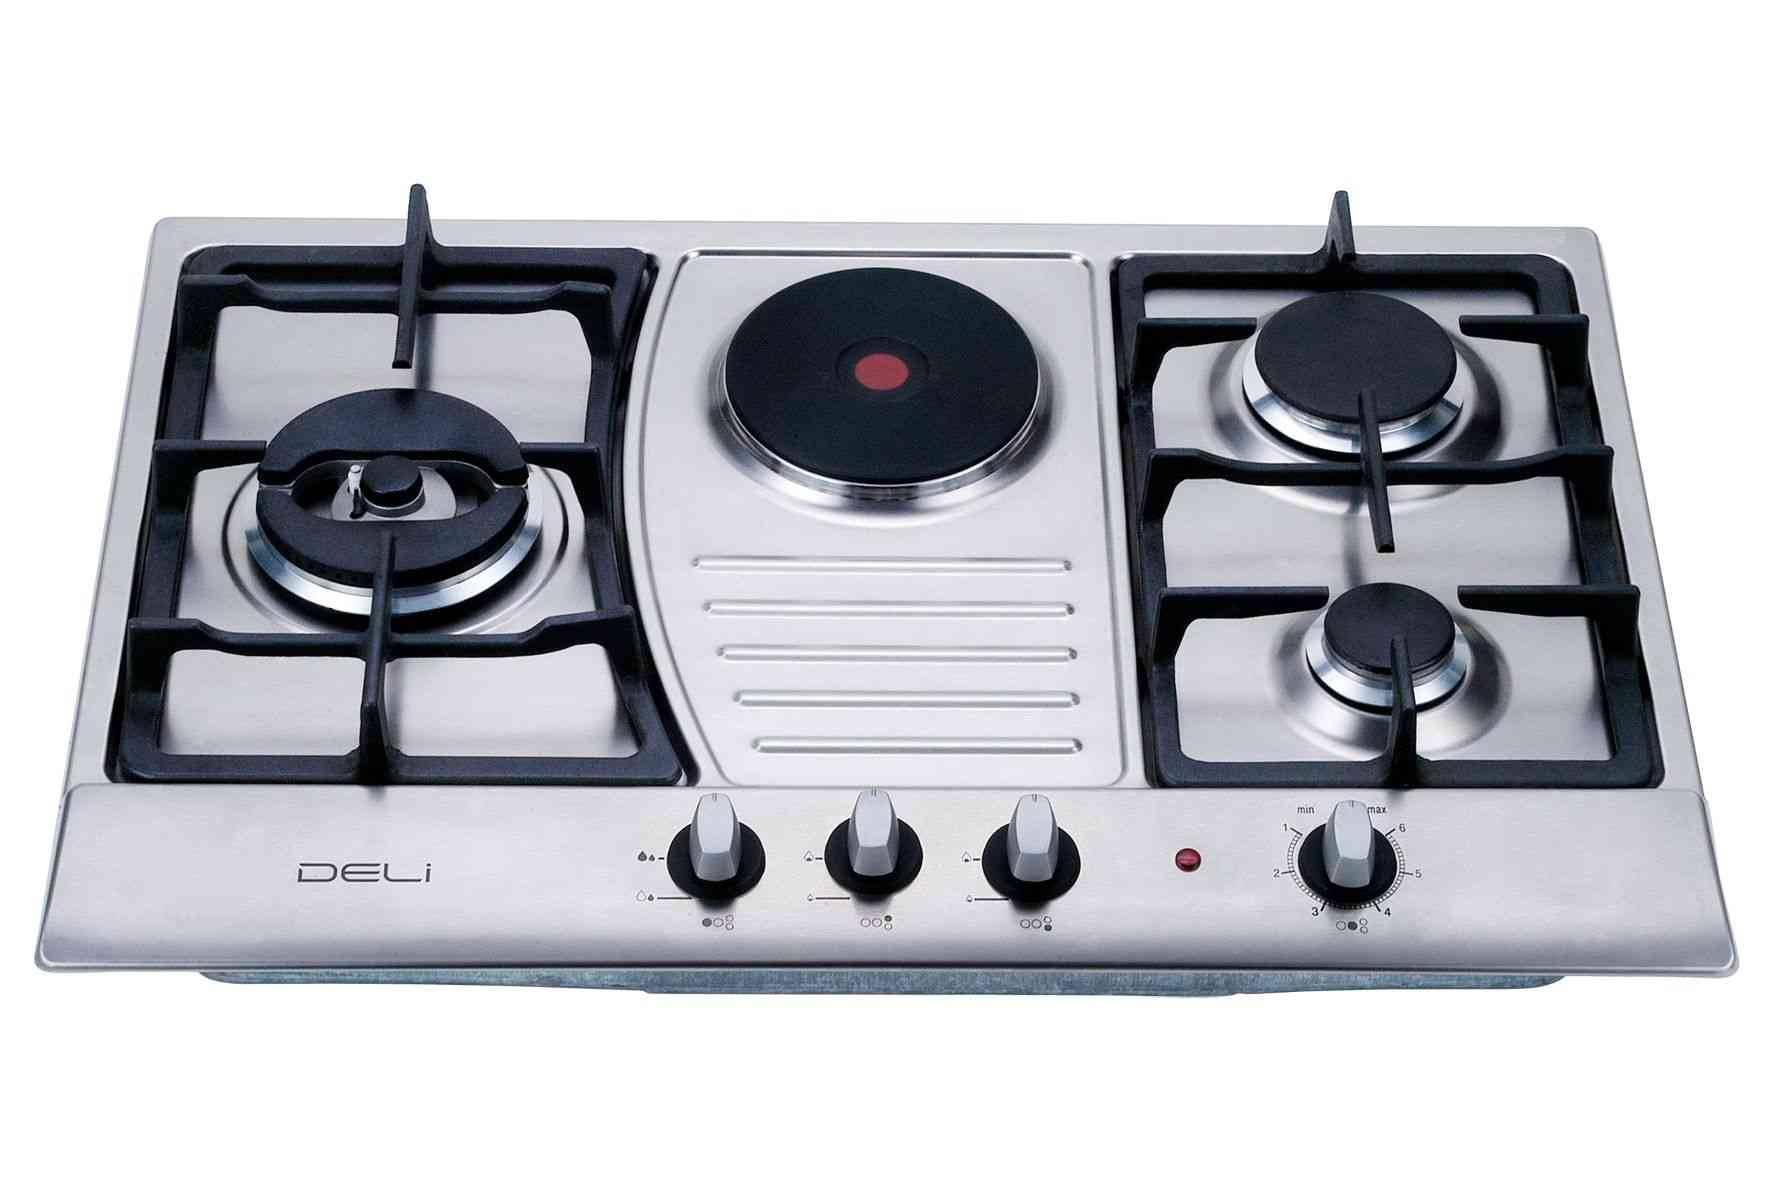 Uncategorized Chinese Kitchen Appliances kitchen appliances appliance store appliances